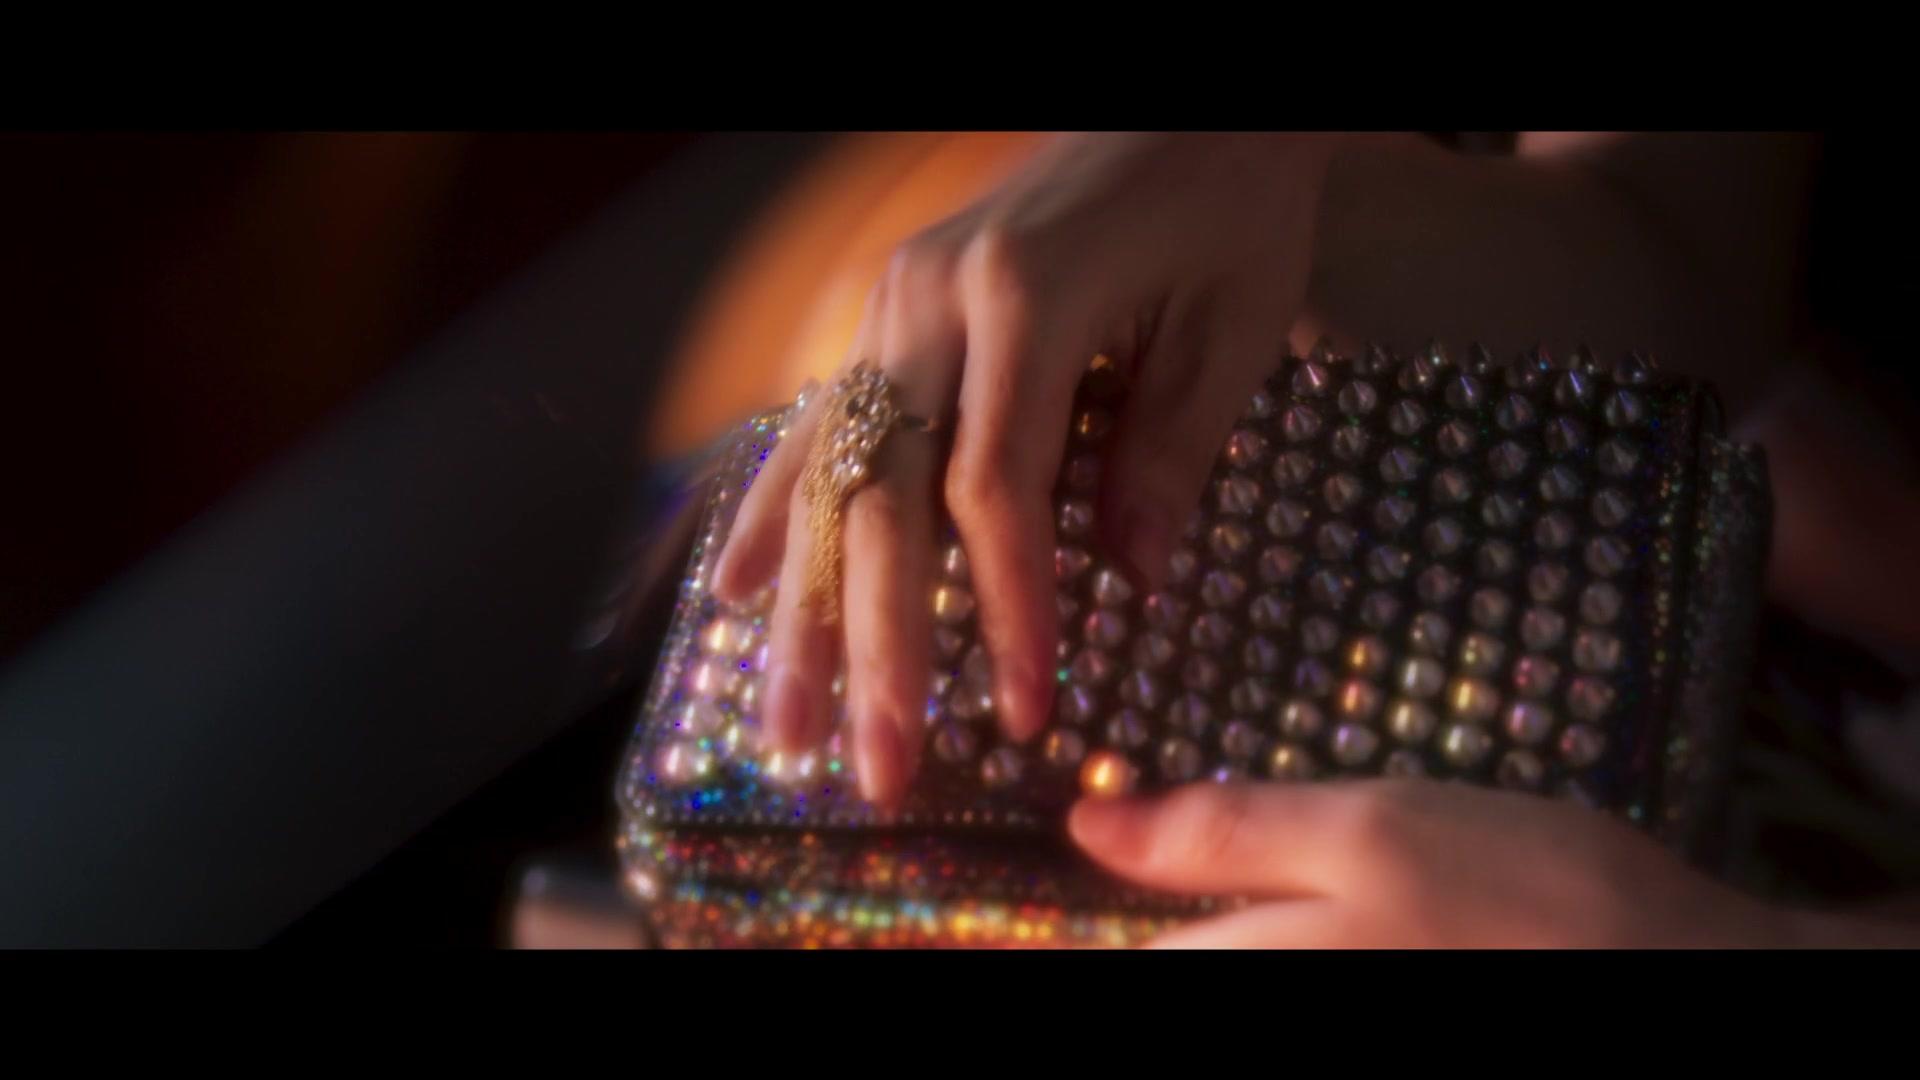 Trailer 1: Big Issue